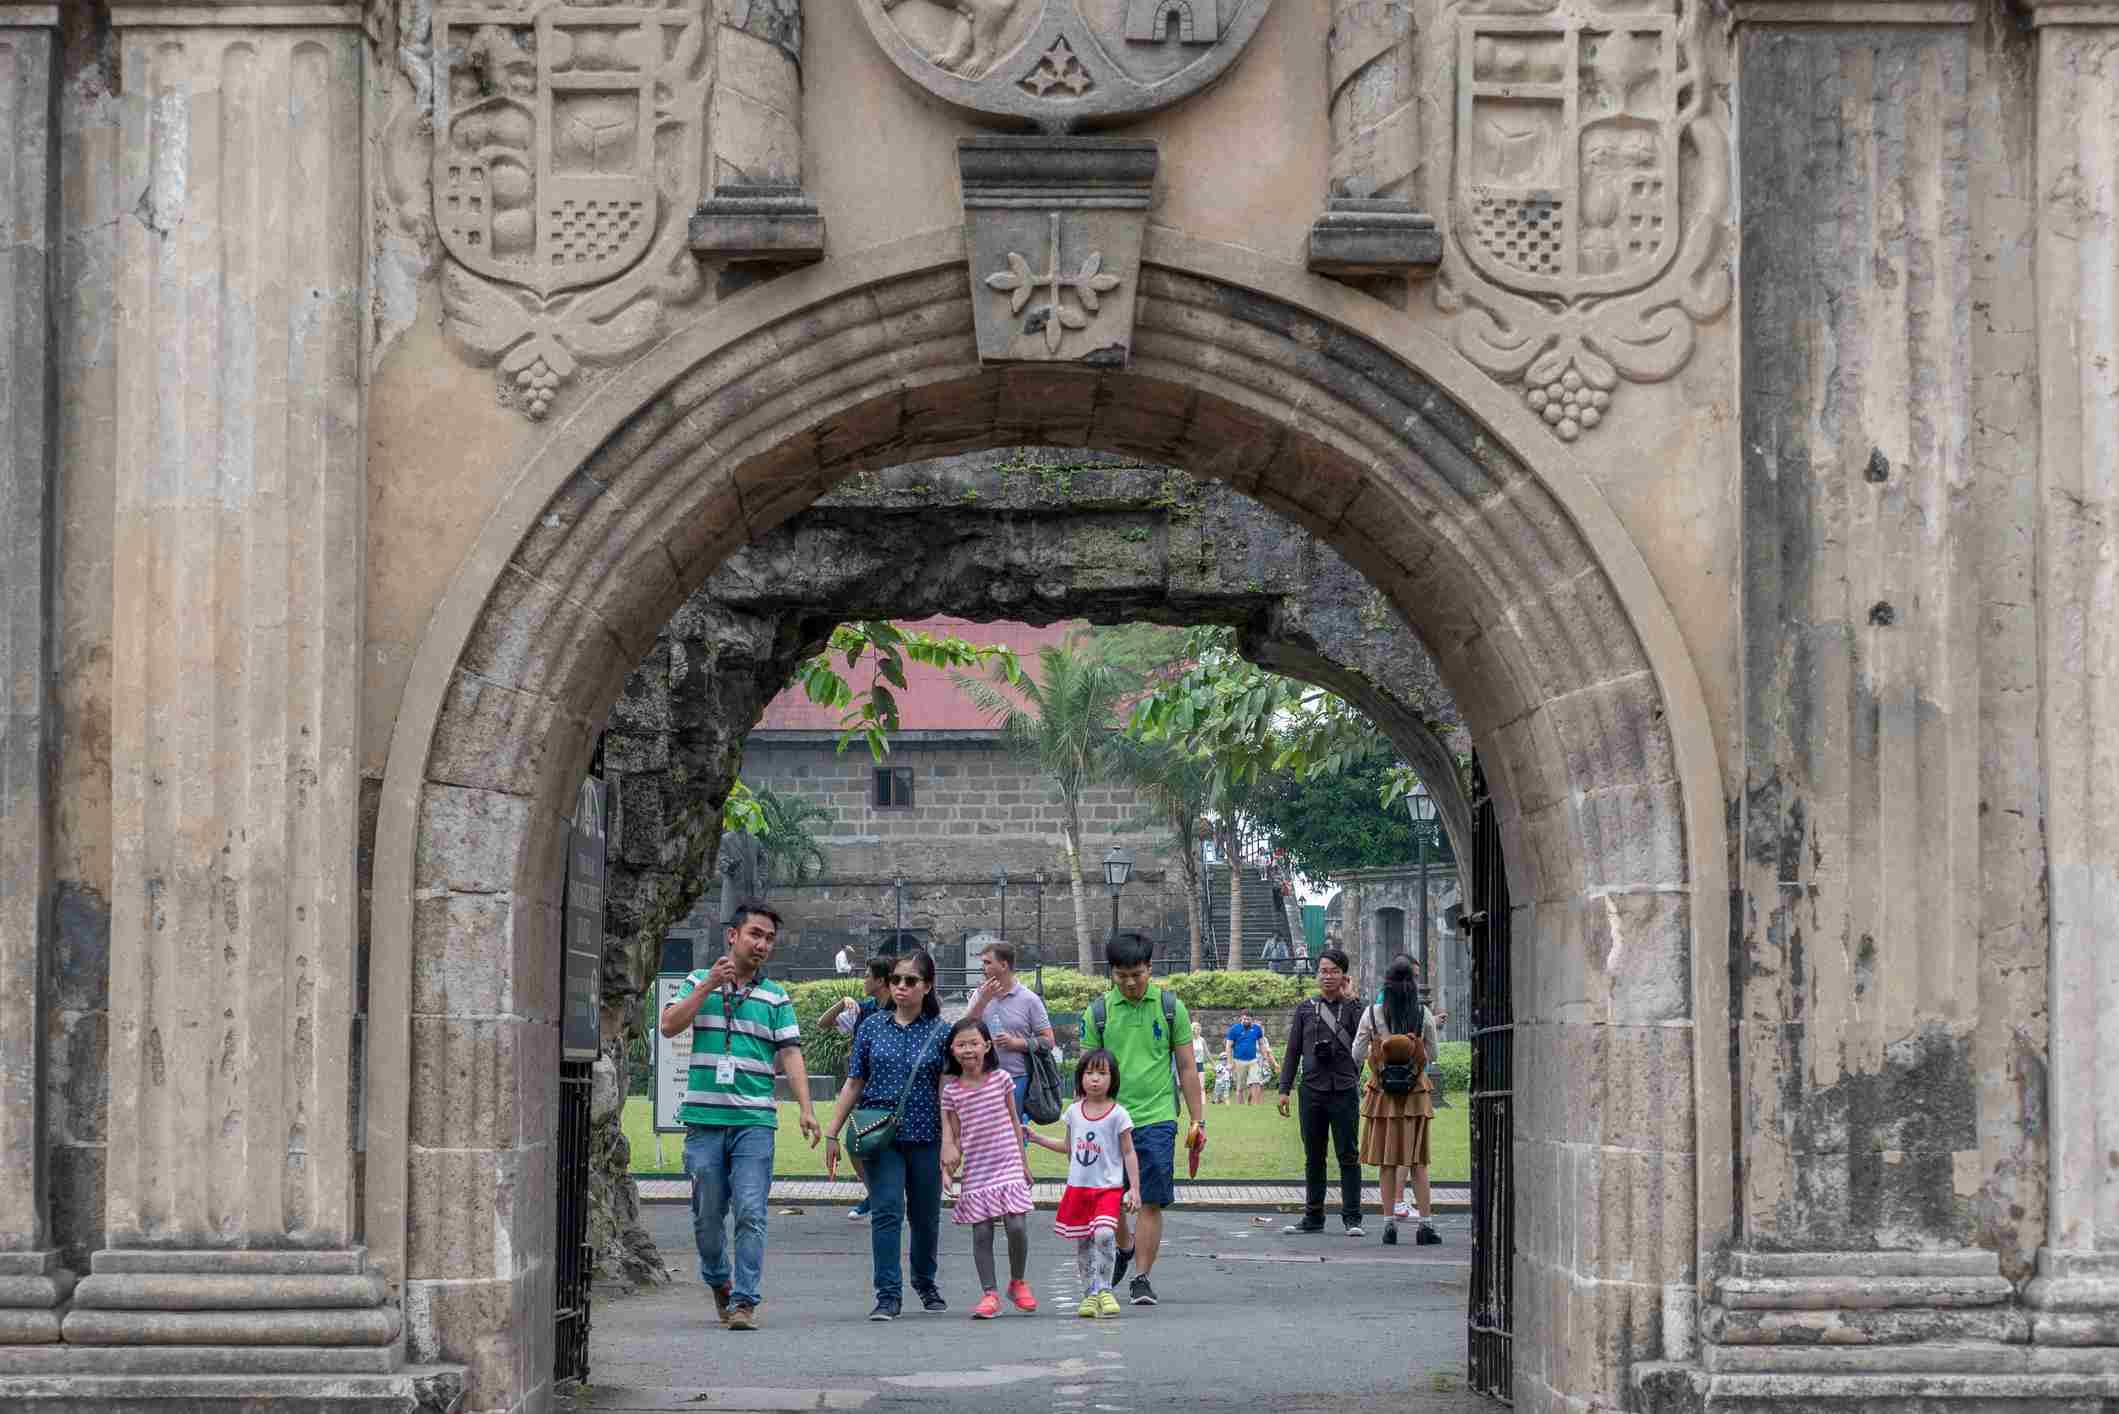 Gate into Fort Santiago, Philippines